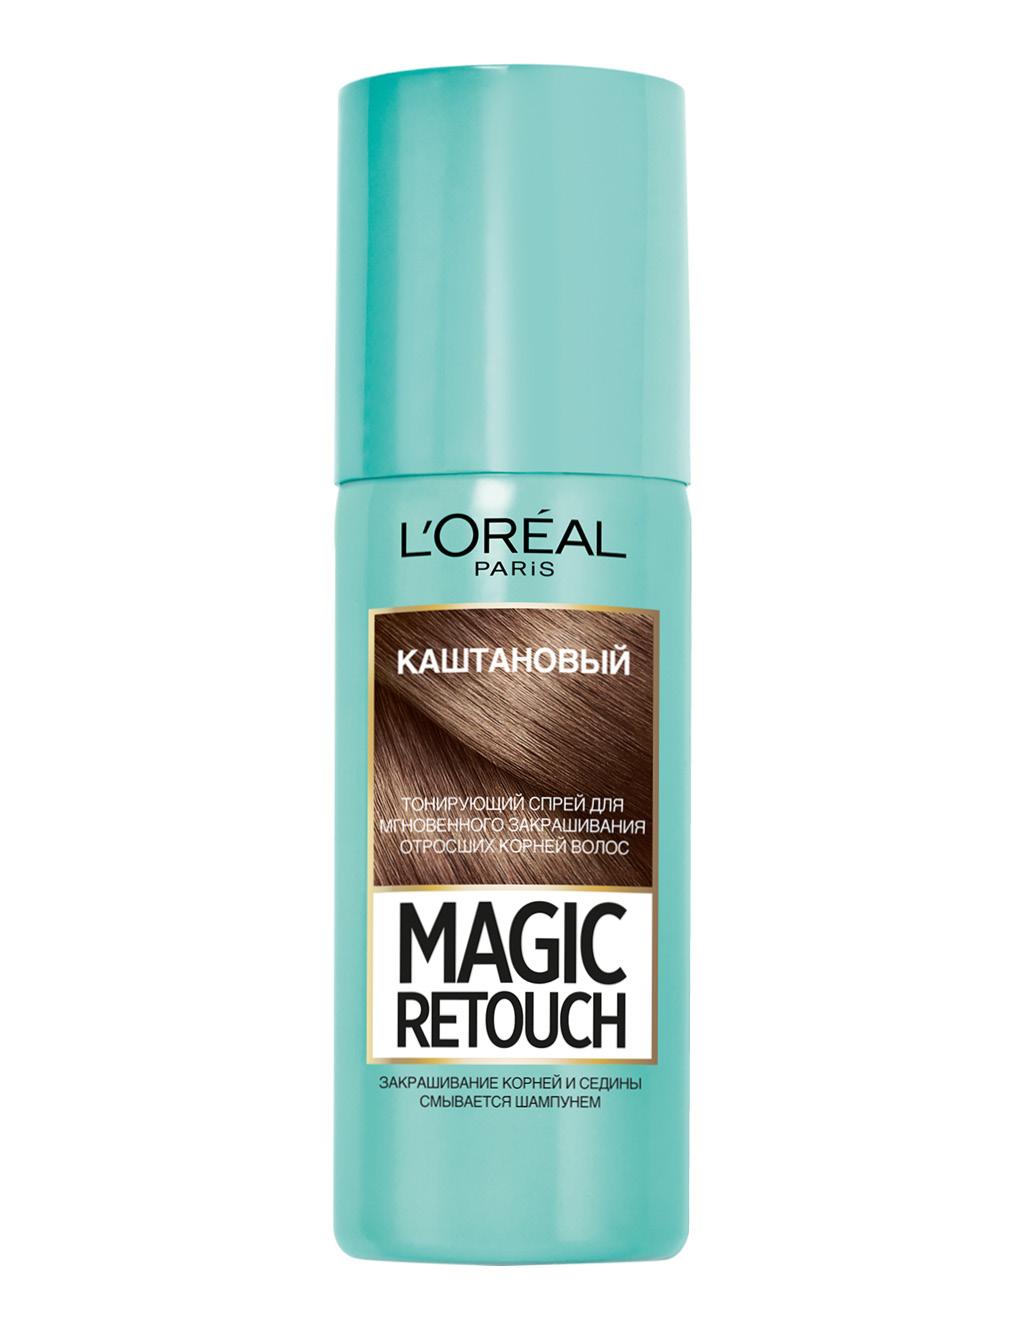 Спрей для волос тонирующий L'Oreal Magic Retouch тон 3 (каштан)